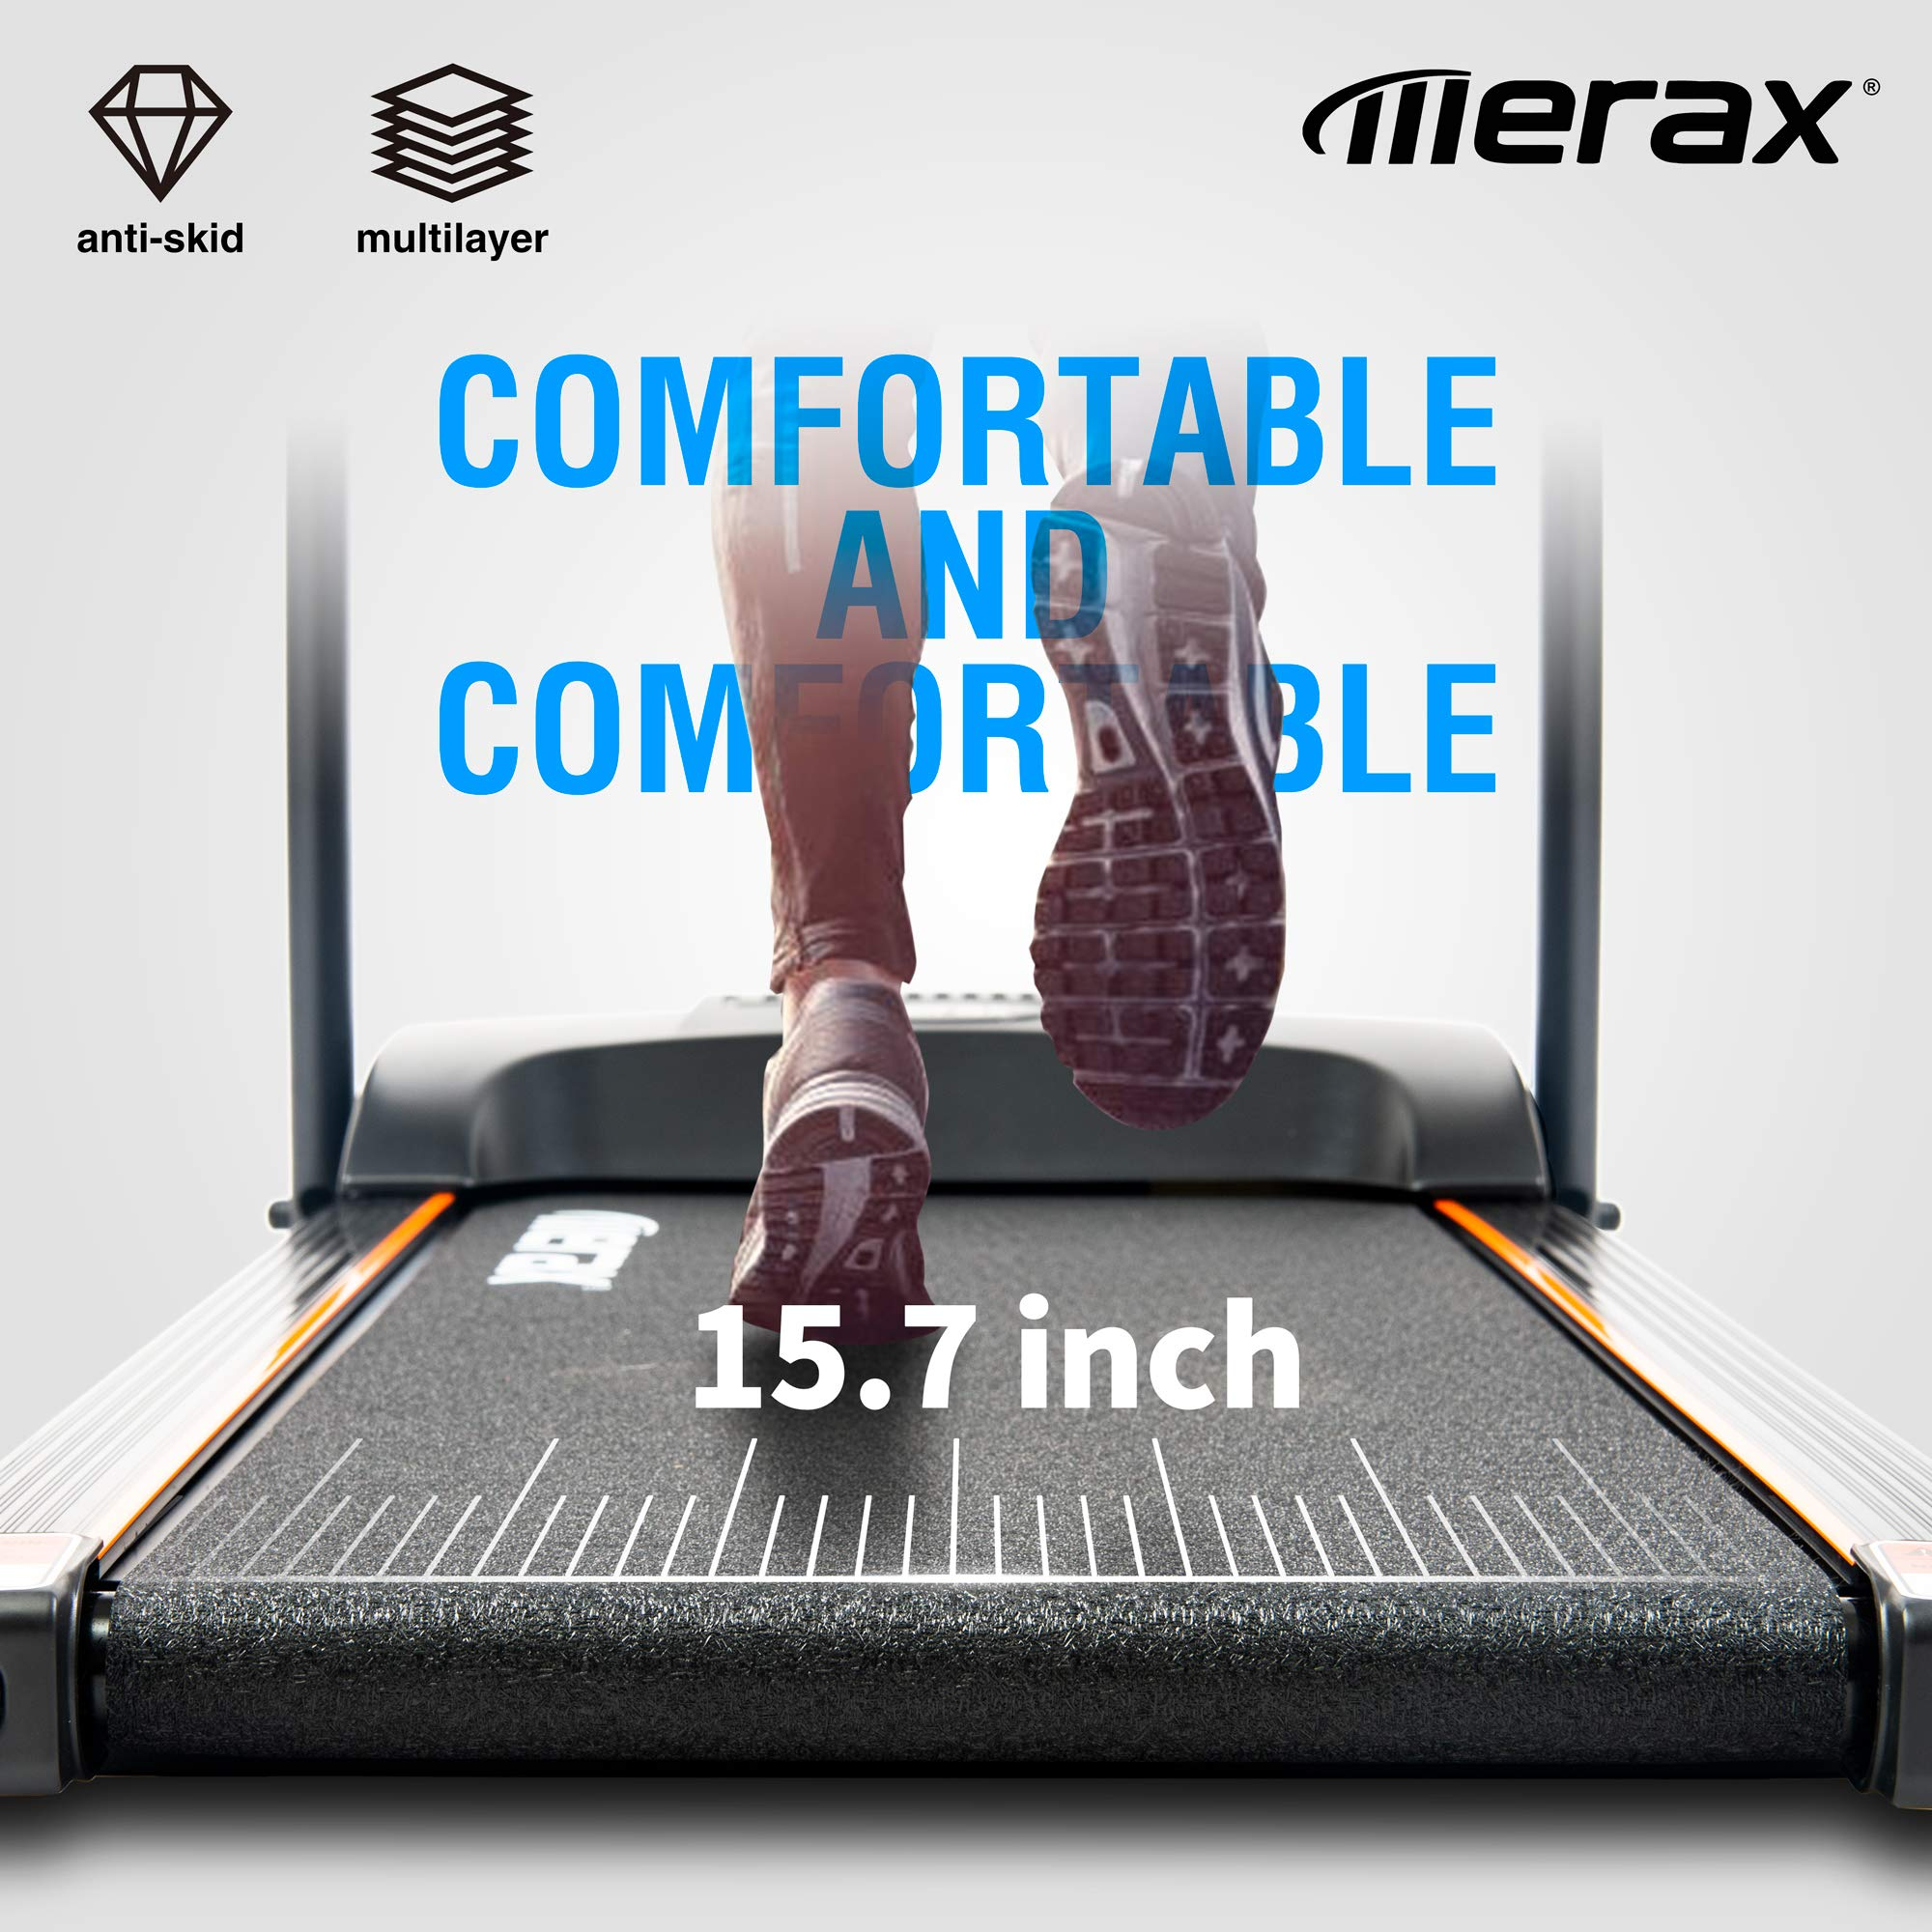 Merax Easy Assembly Folding Electric Treadmill Motorized Running Machine by Merax (Image #3)